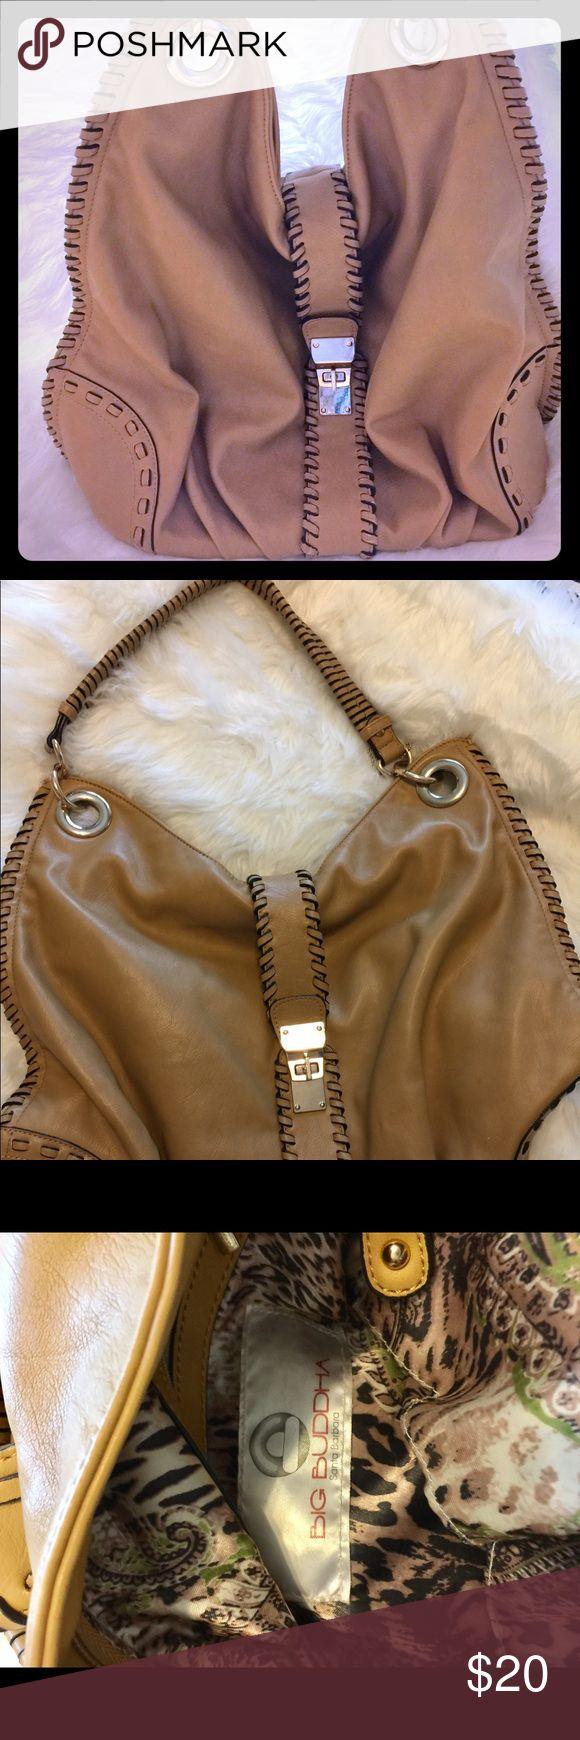 Authentic Big Buddha Bag Big Buddha shoulder bag. Very roomy inside. Plenty of pockets inside and out. Perfect for any season. Big Buddha Bags Shoulder Bags